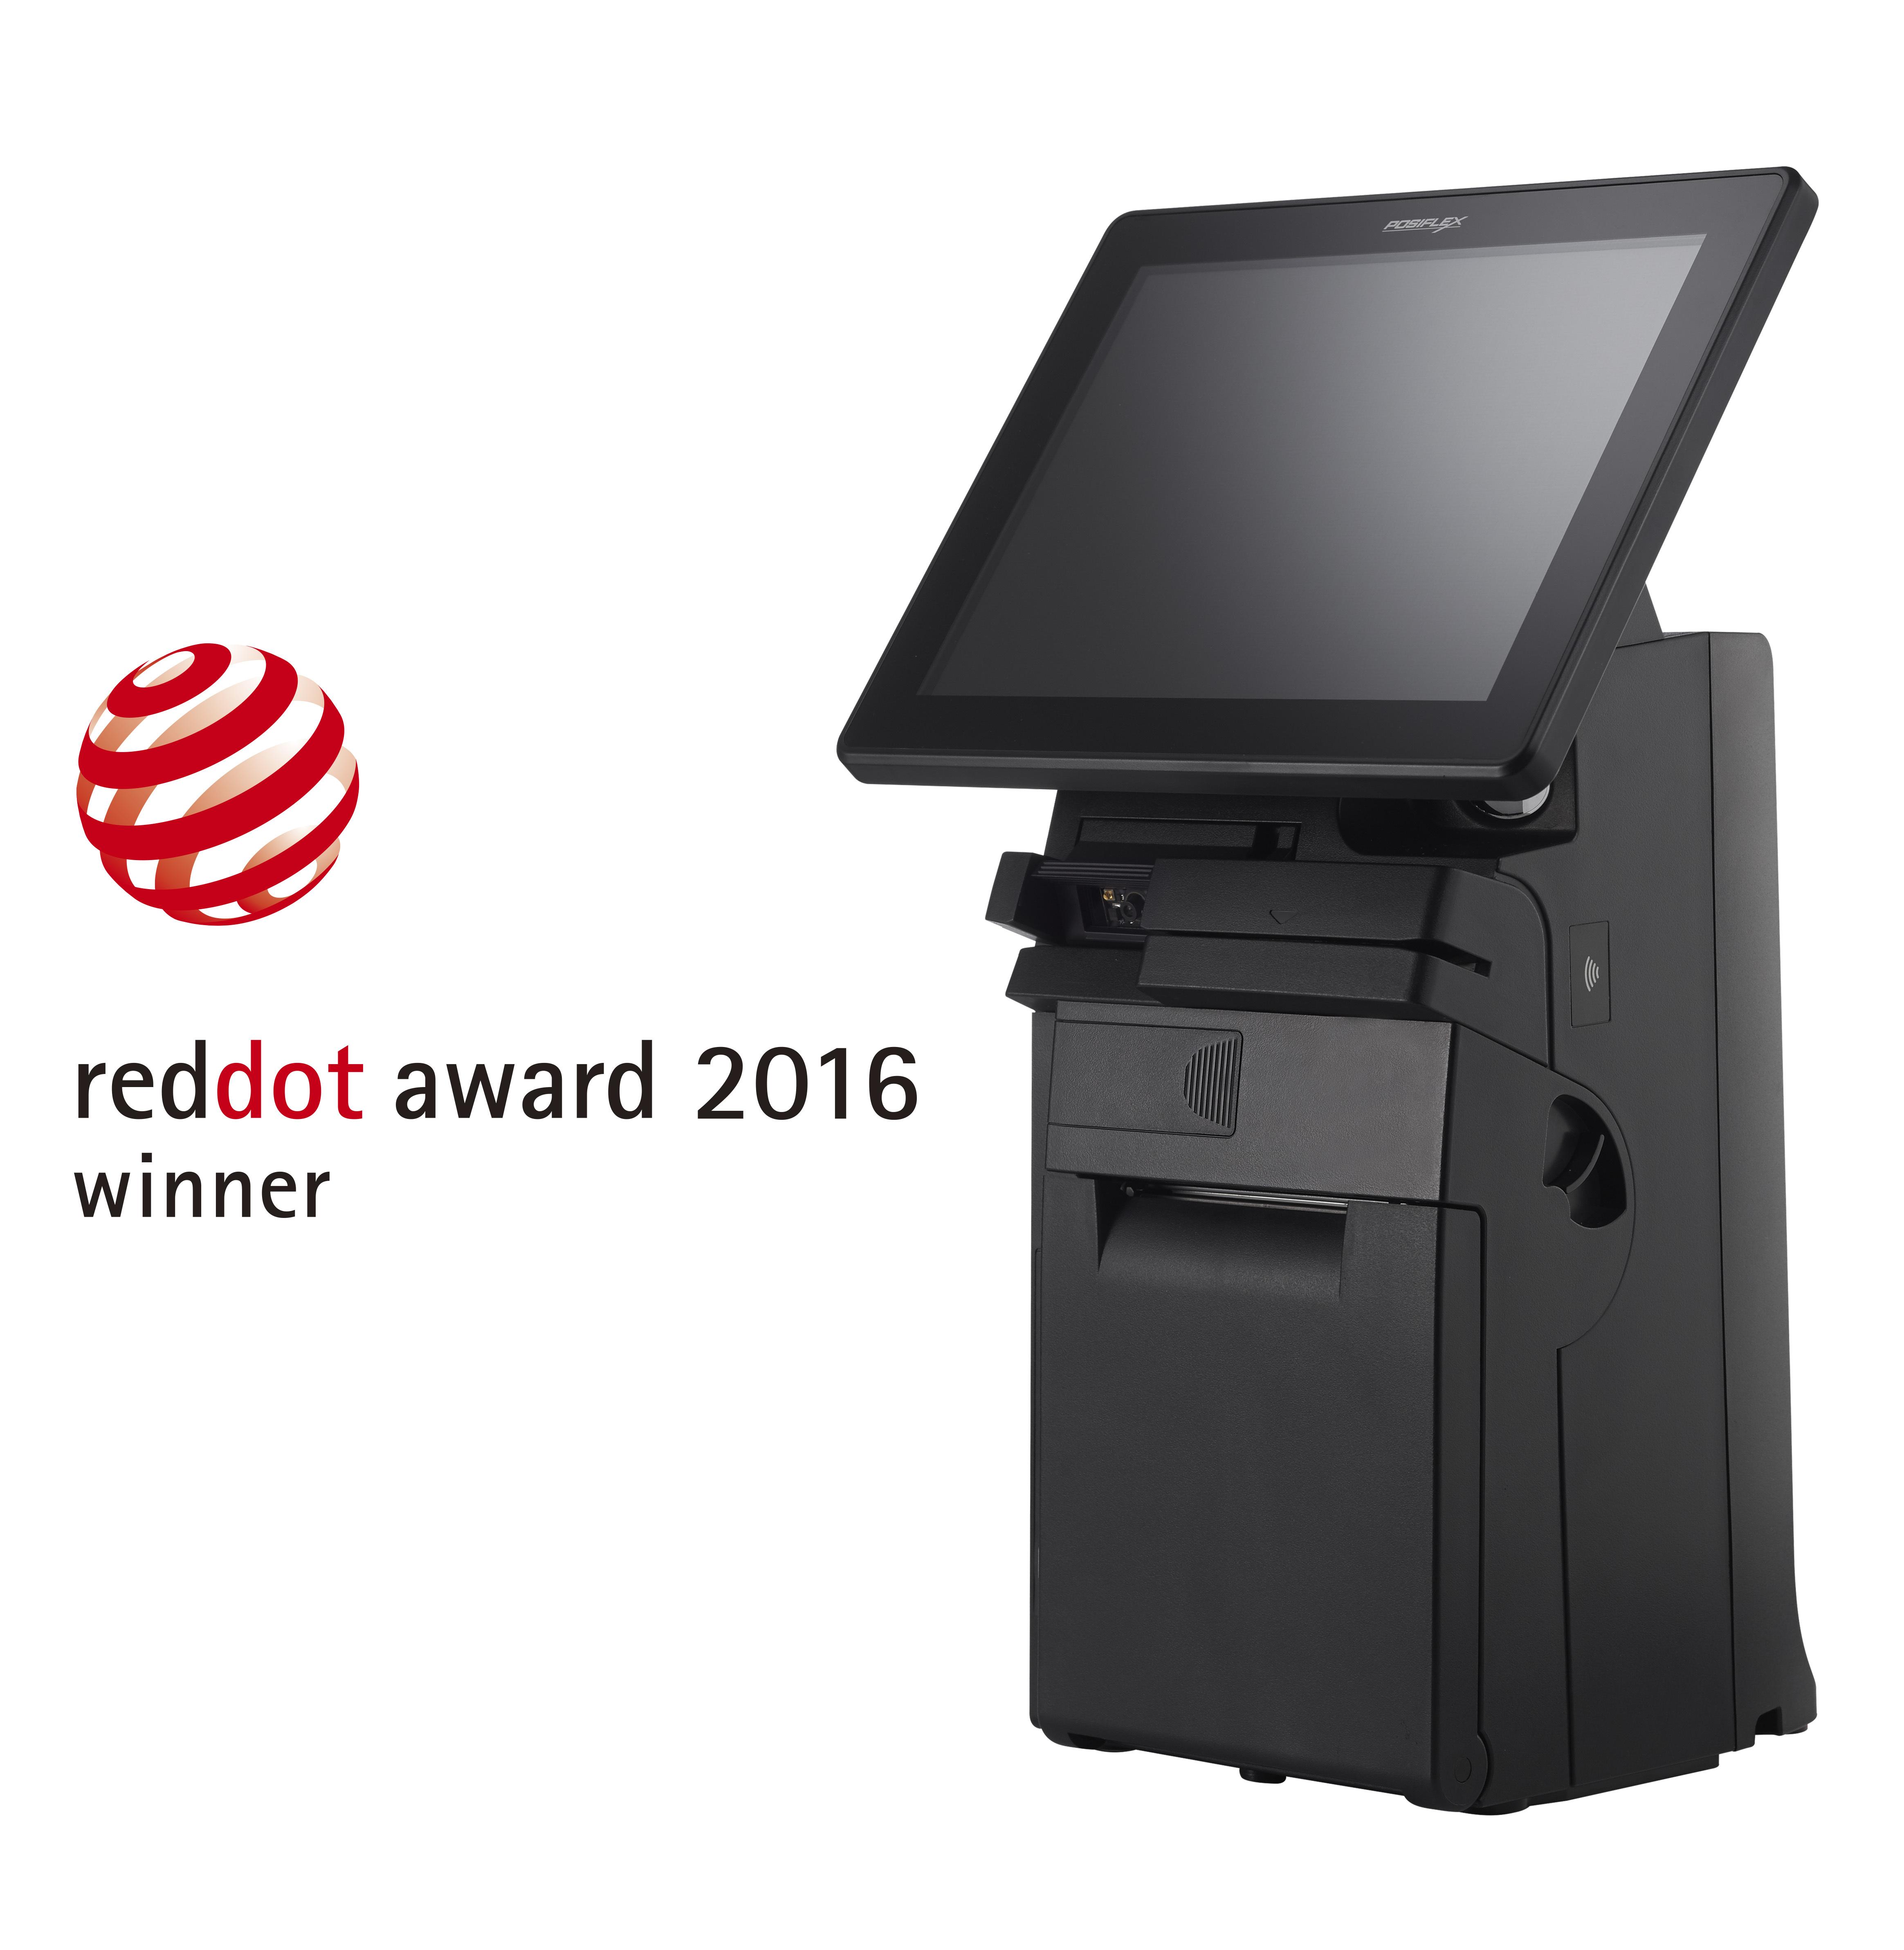 Leading POS Brand Posiflex Wins Prestigious Red Dot Award for New ...